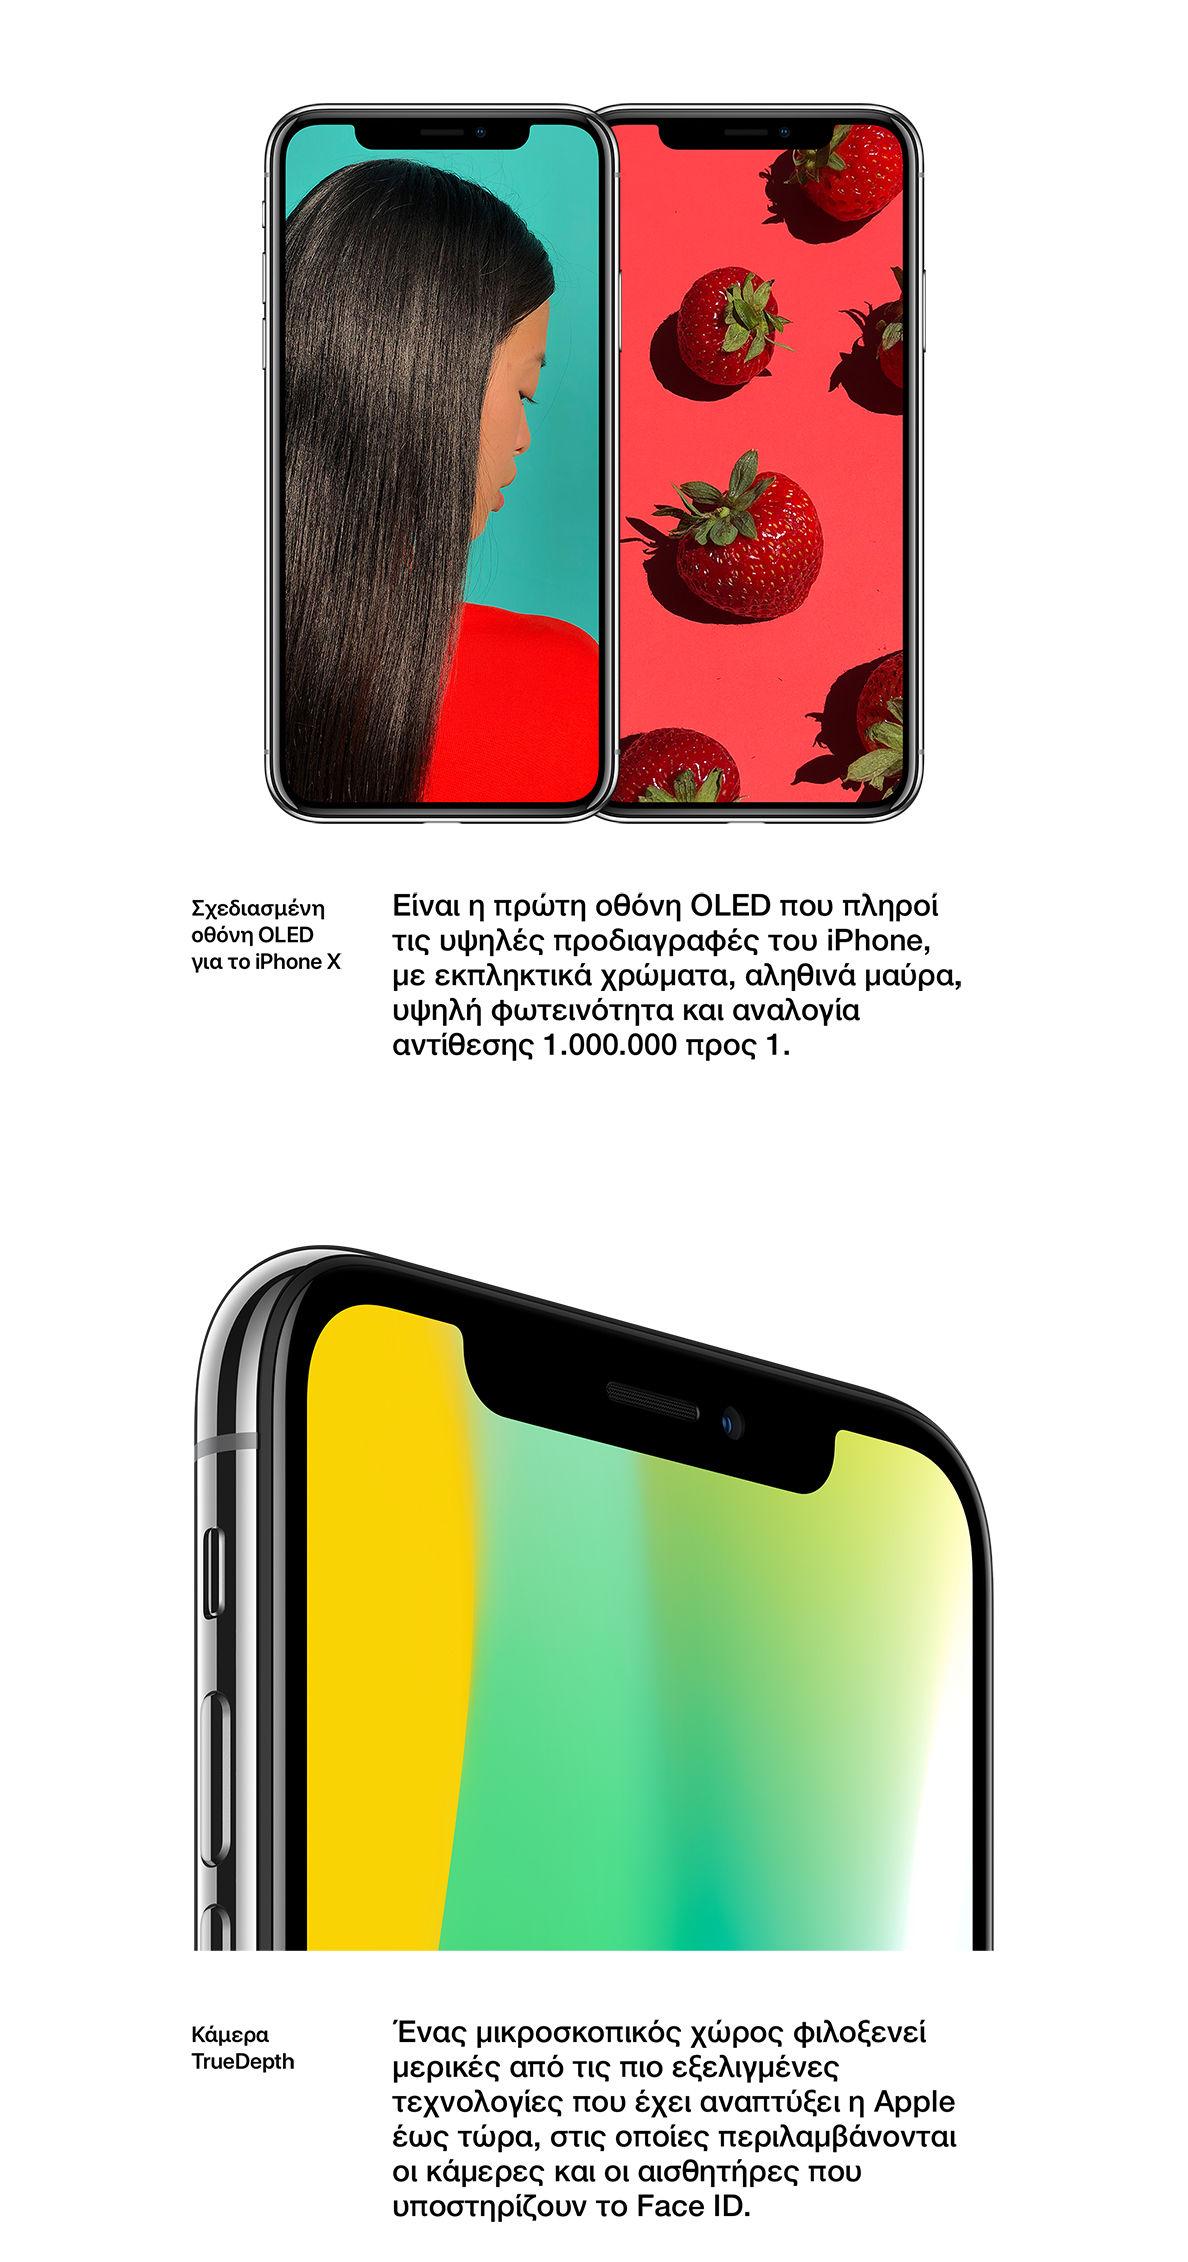 iPhonex-agora-Ellada-Mediamarkt-public-kotsovolos-germanos-iPhoneX-diathesimo-gia-paraggelia-november-2017 (3)